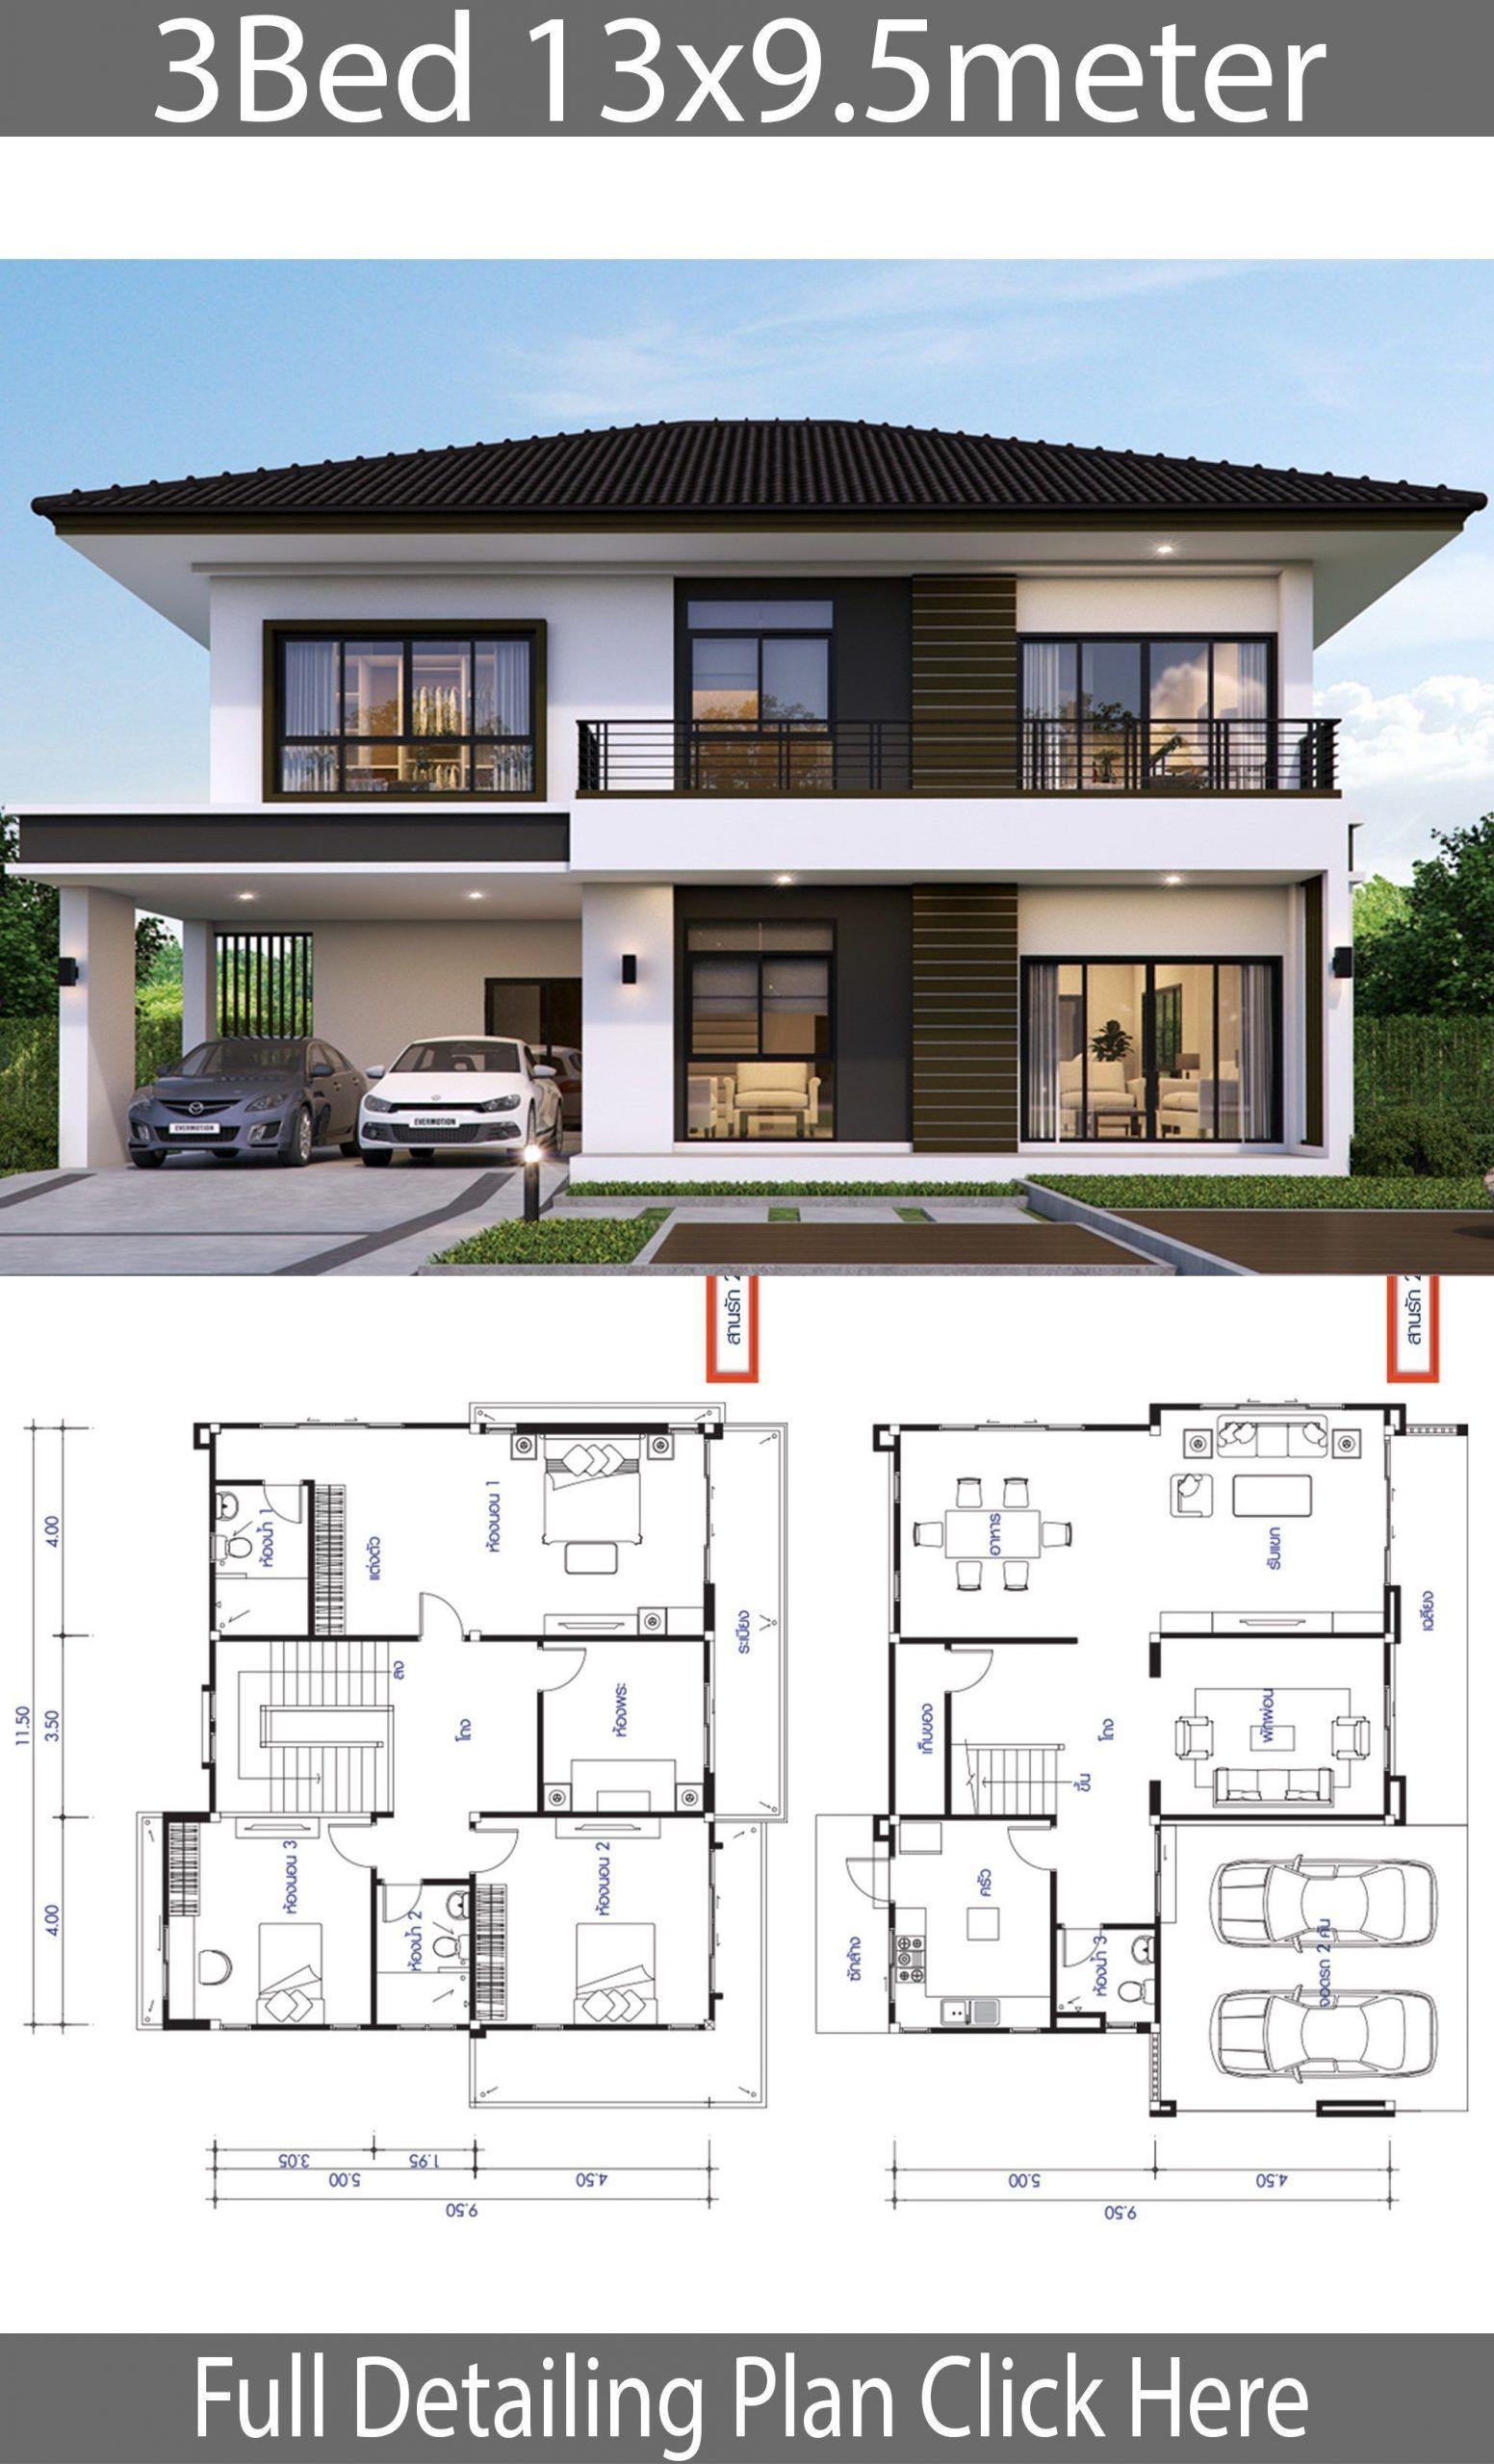 Best 3 Bedroom House Designs 2021